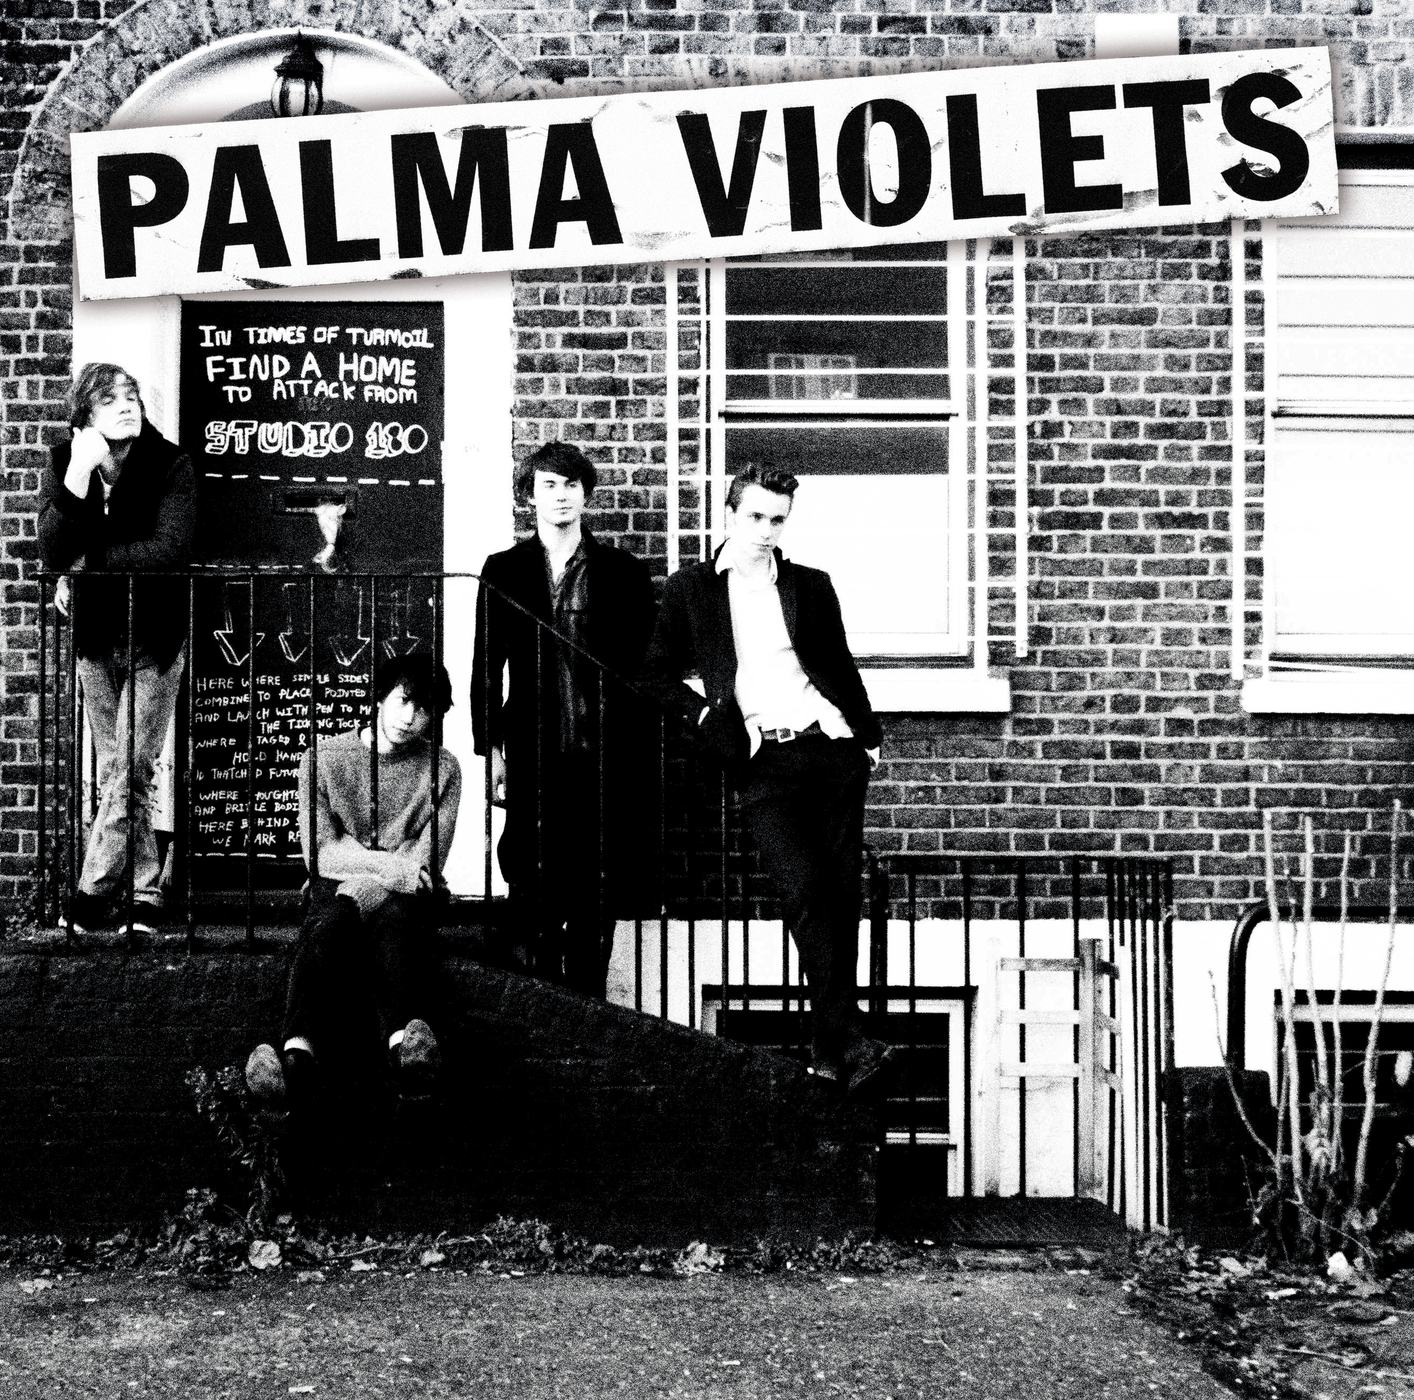 Best of Friends - Palma Violets